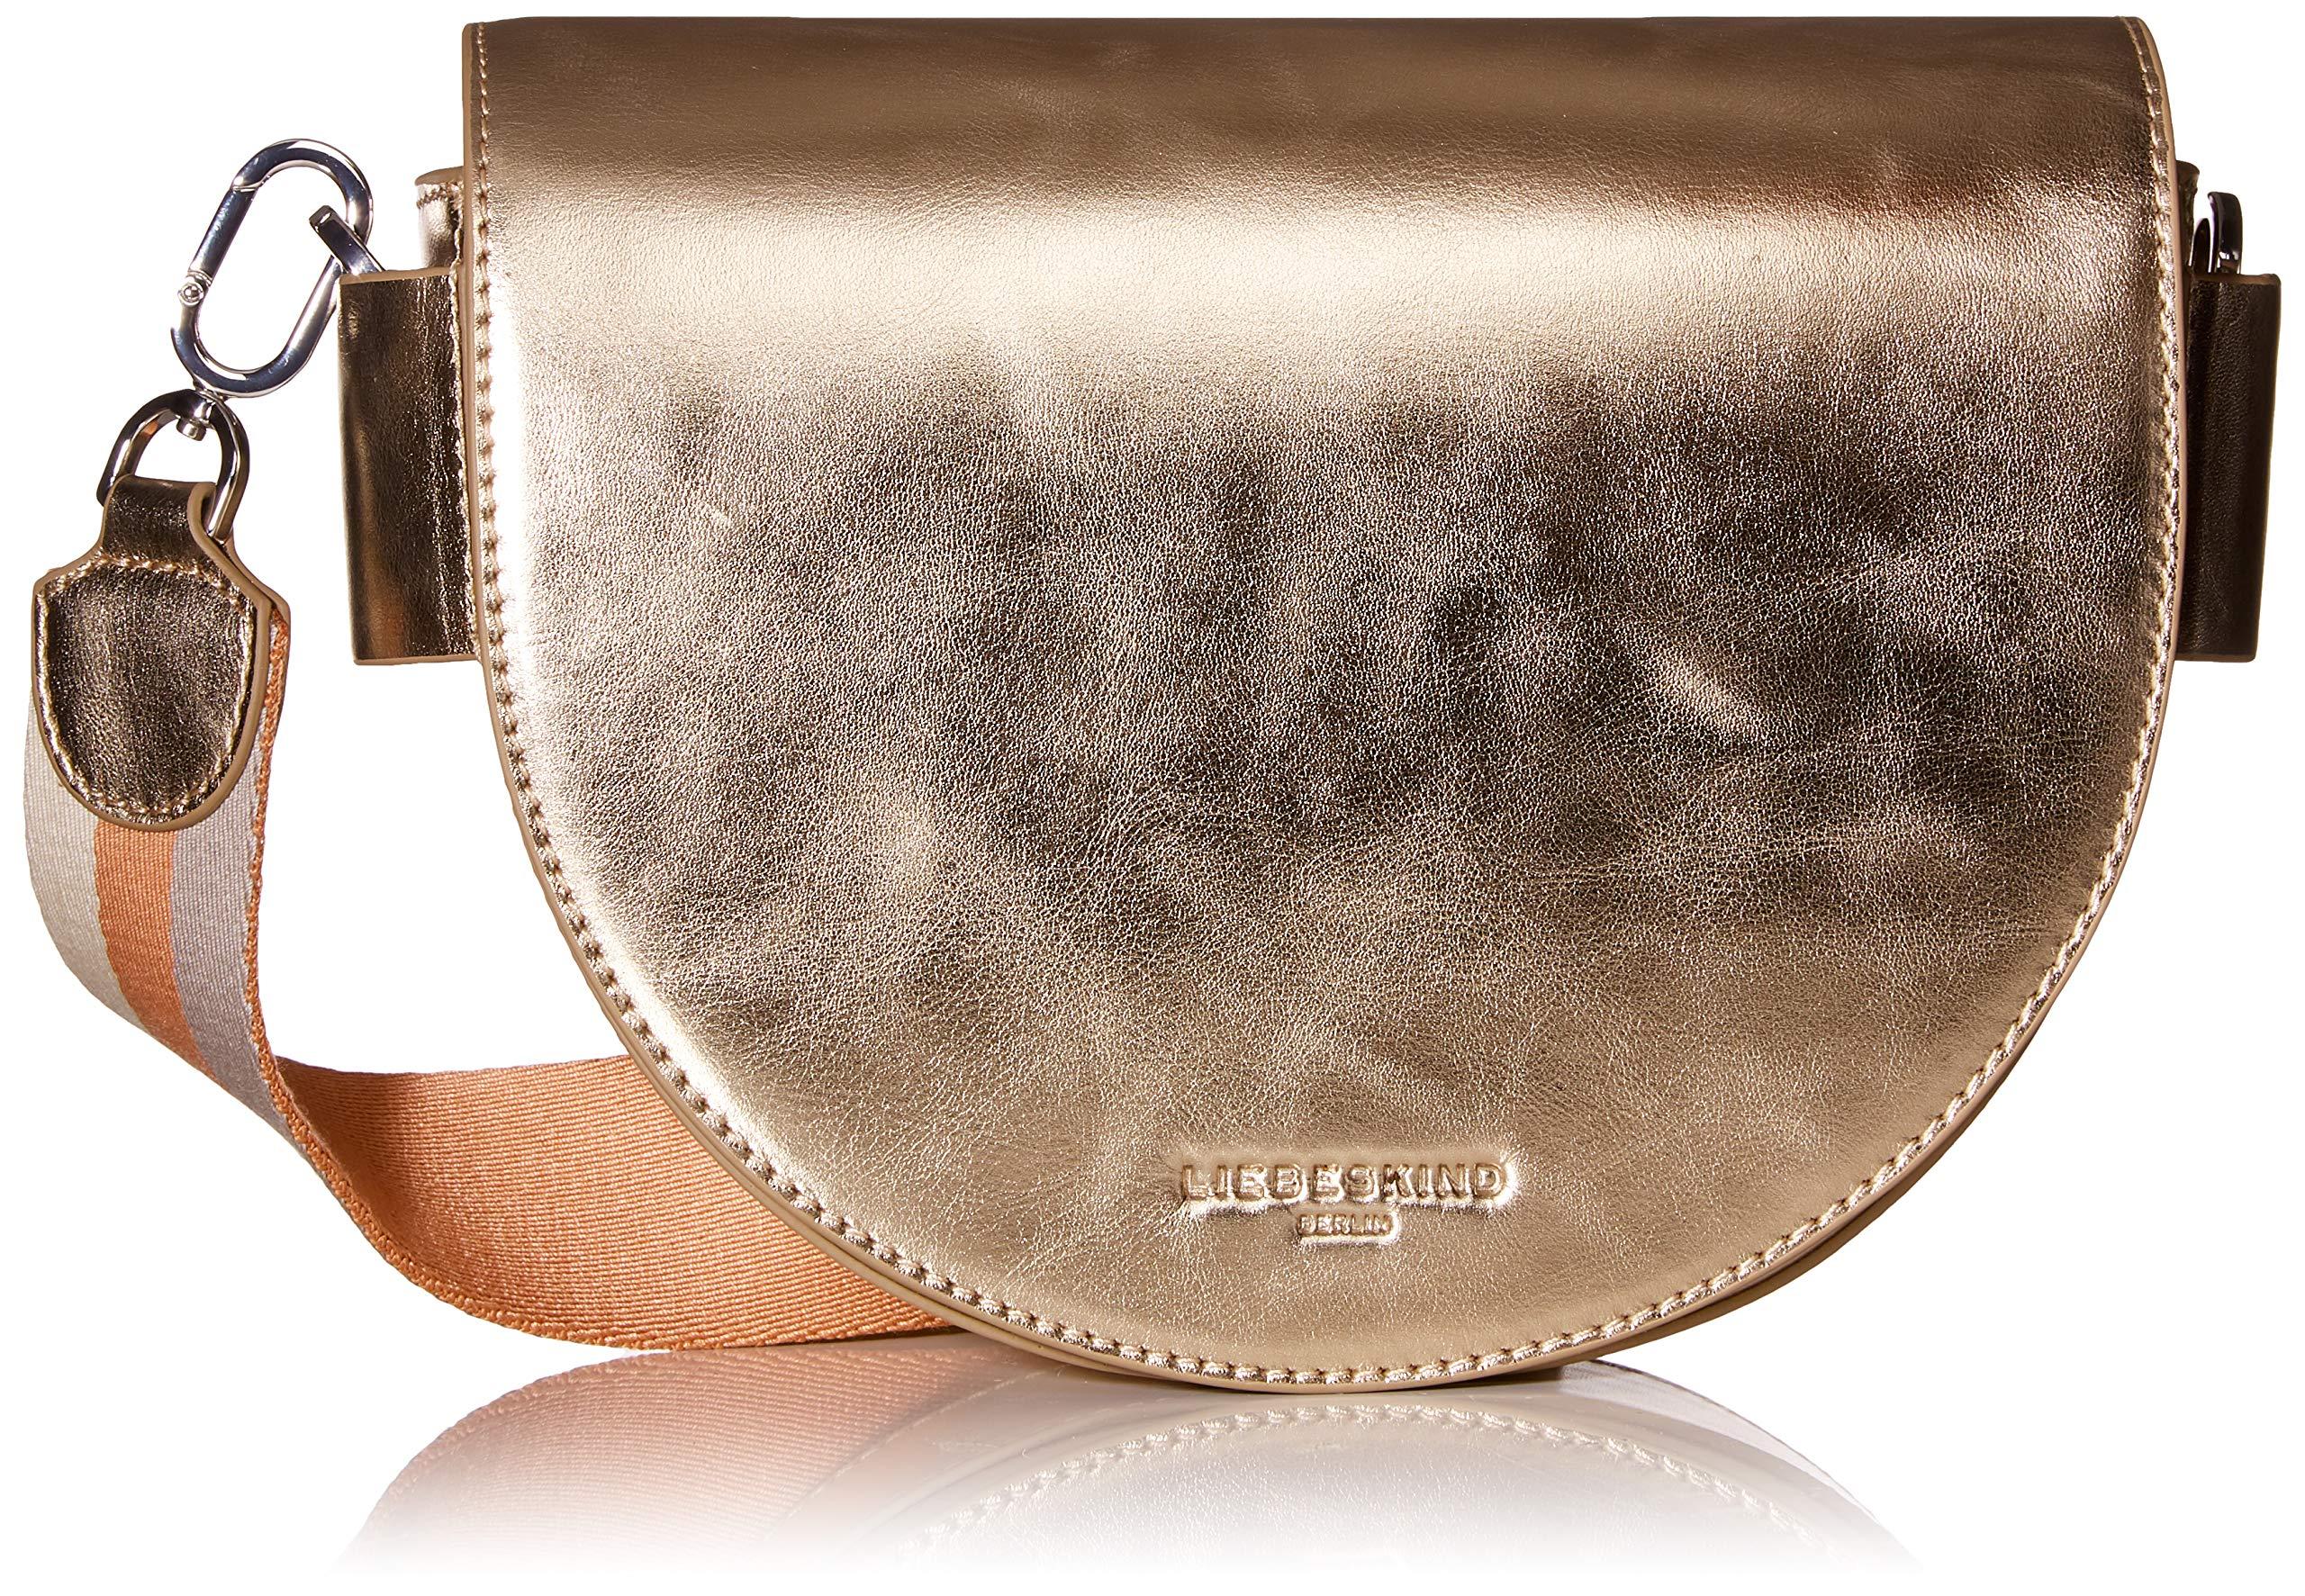 X H L Mixedbag FemmeOrmoonlight6x20x27 Liebeskind Berlin Medium CrossbodySacs Cmw Bandoulière FK1TlJ3c